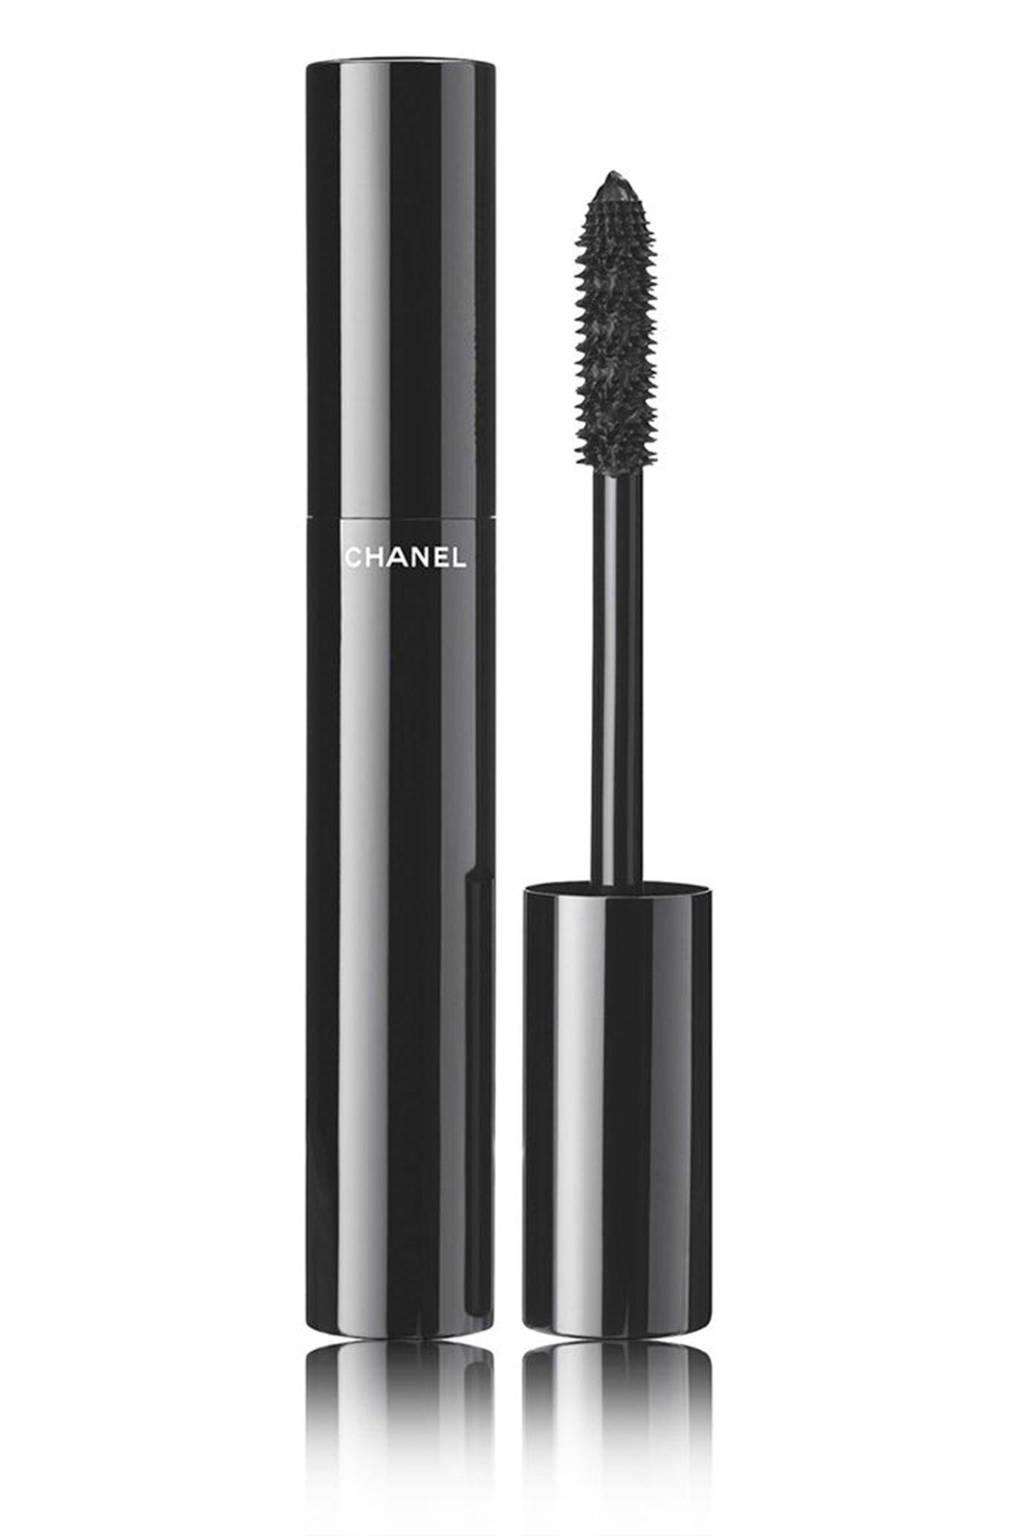 Chanel Le Volume waterproof mascara - 10 Noir